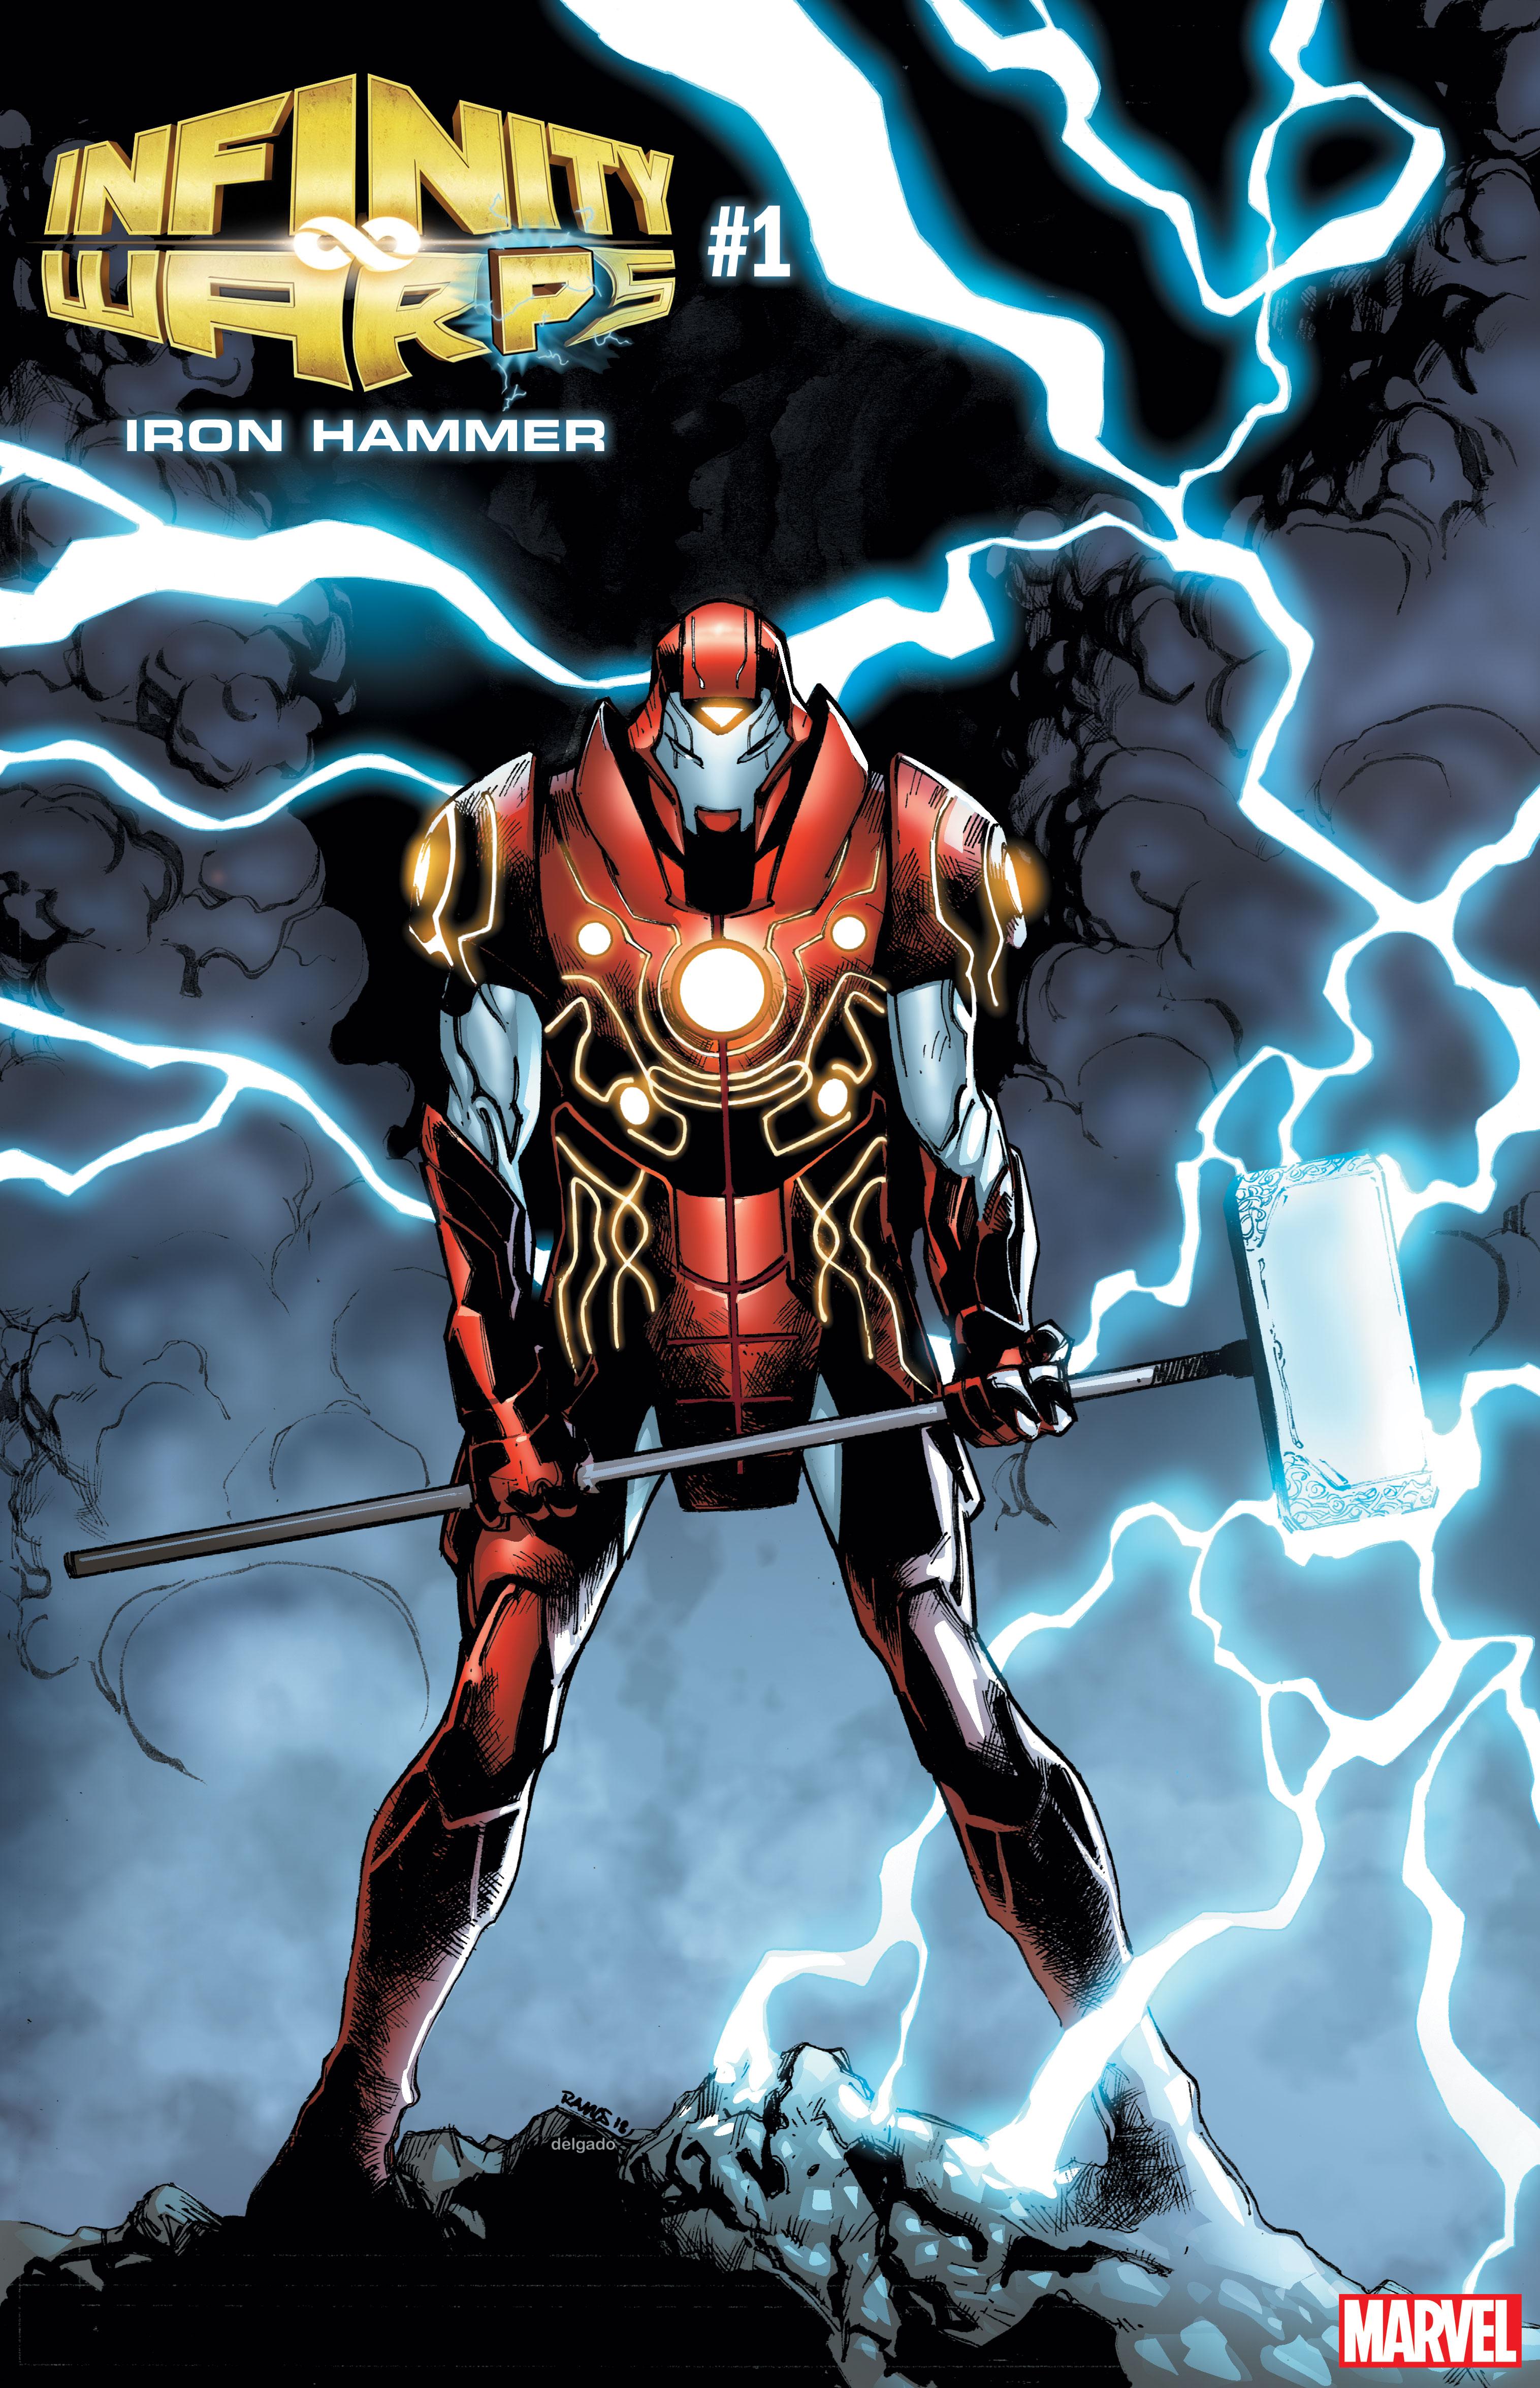 Infinity War: Iron Hammer